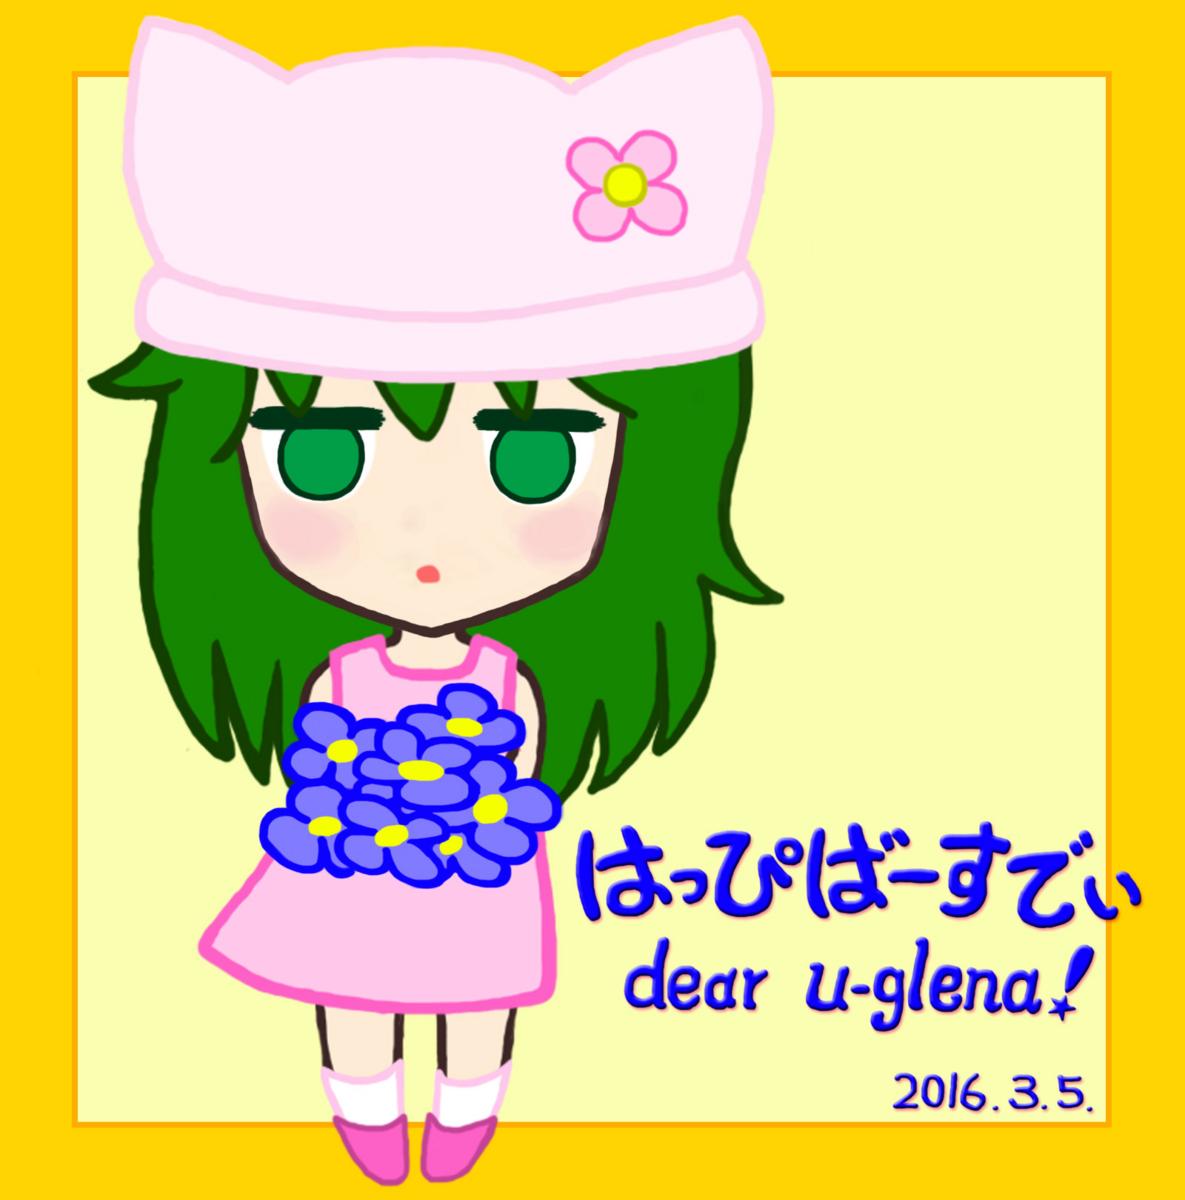 Happy birthday to id:u-glena